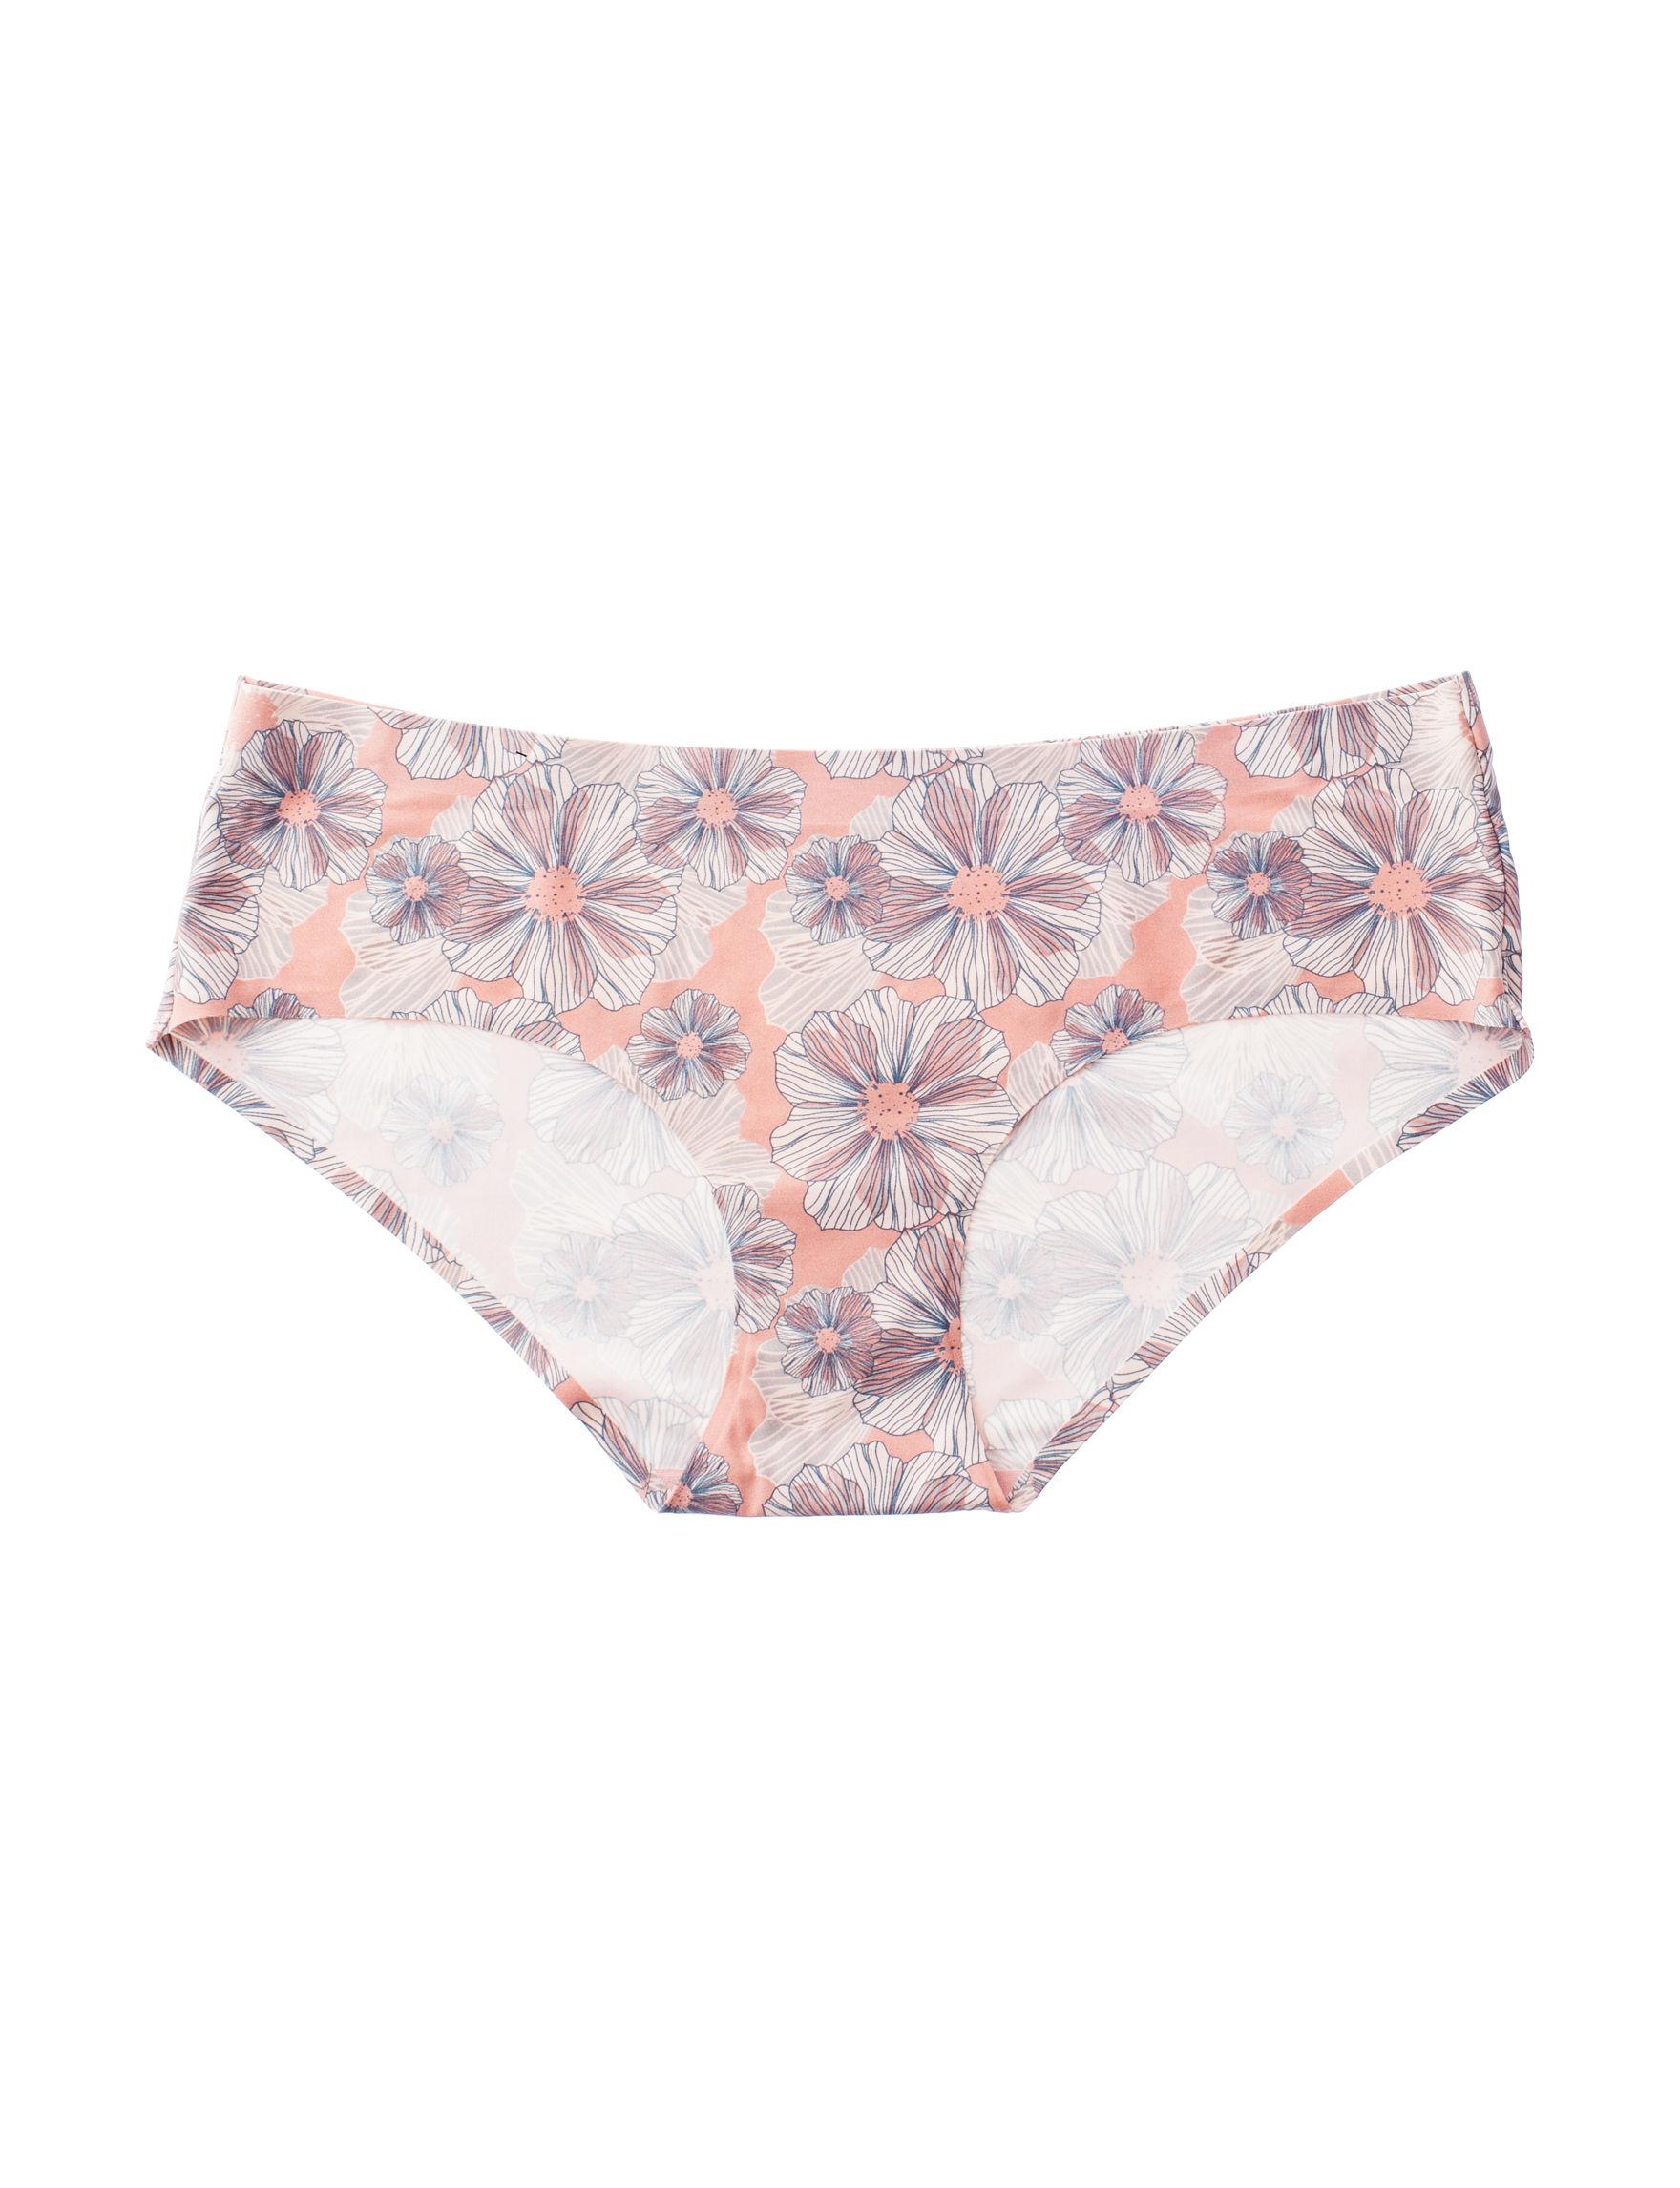 Rene Rofe Brown Floral Panties Hipster